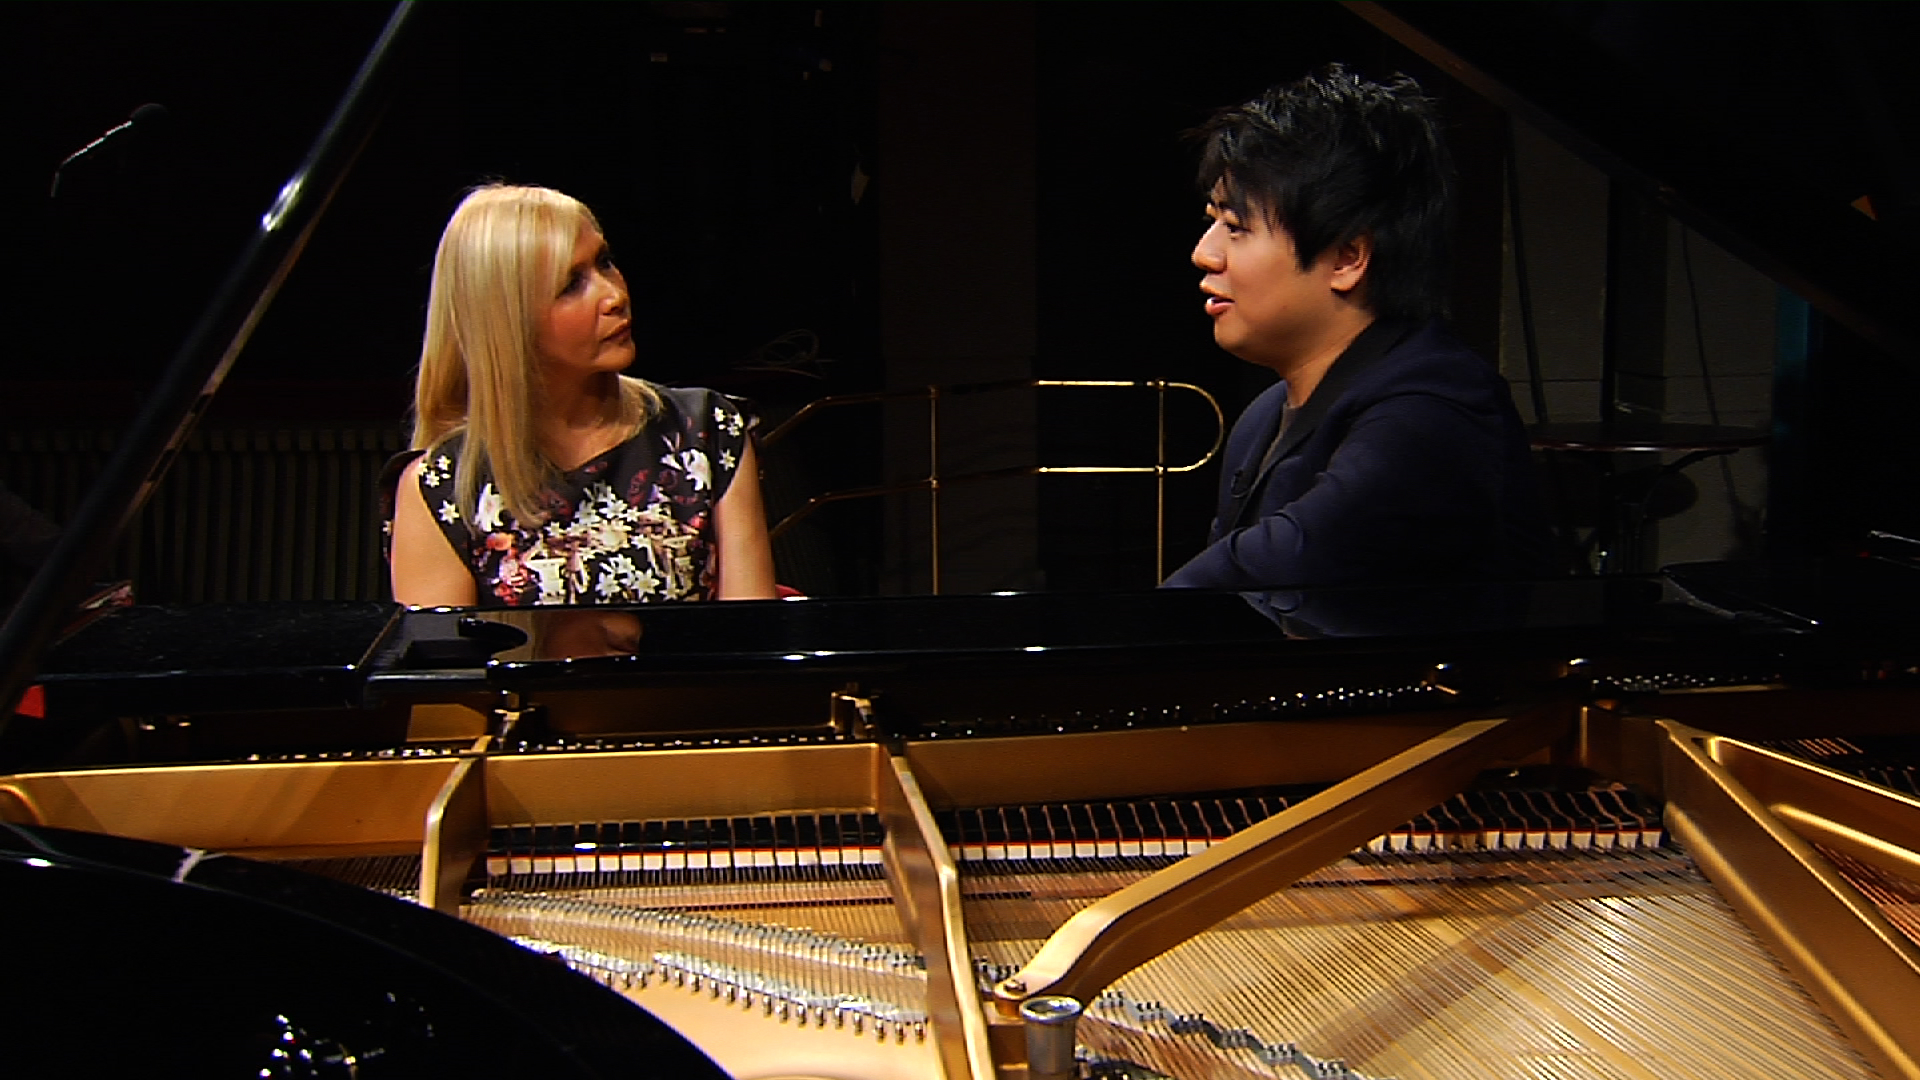 Lang Lang & Tania 2 shot